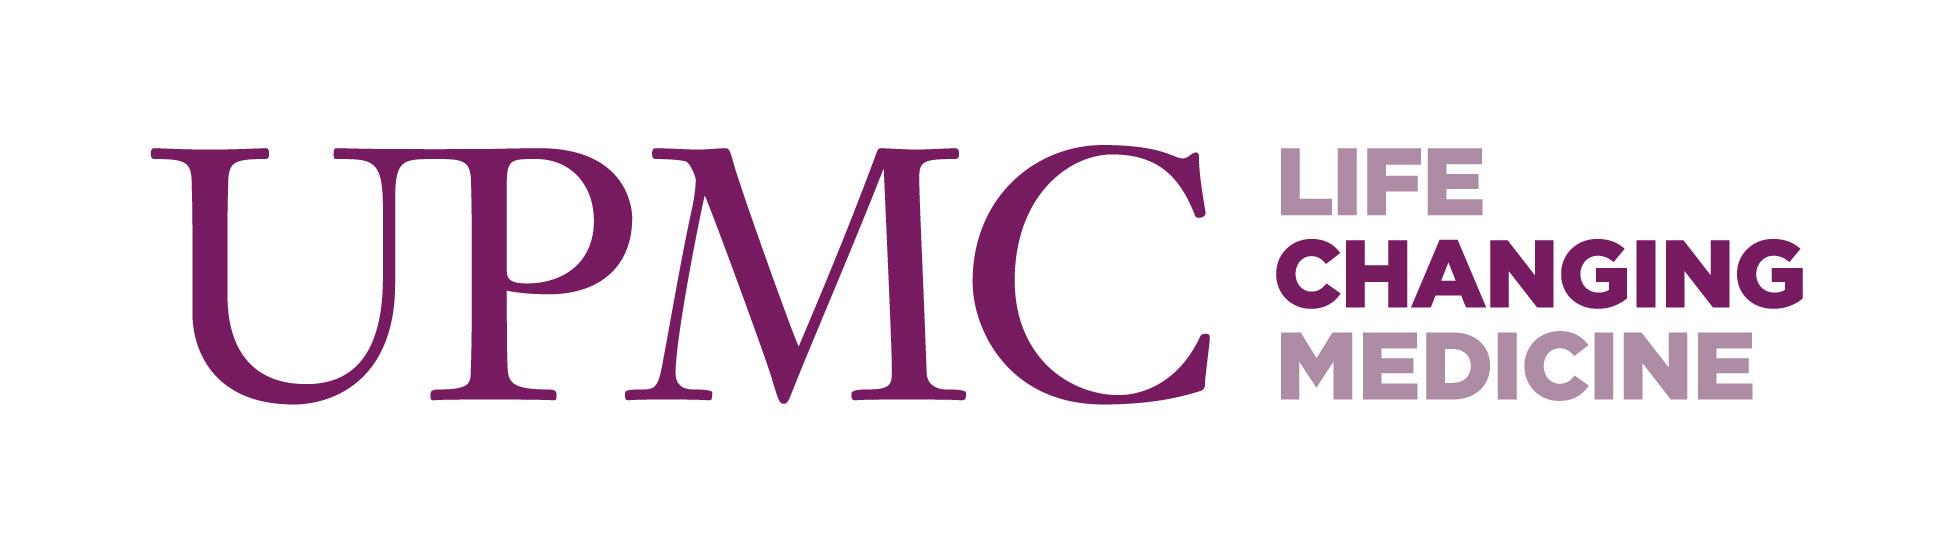 UPMC logo.jpg